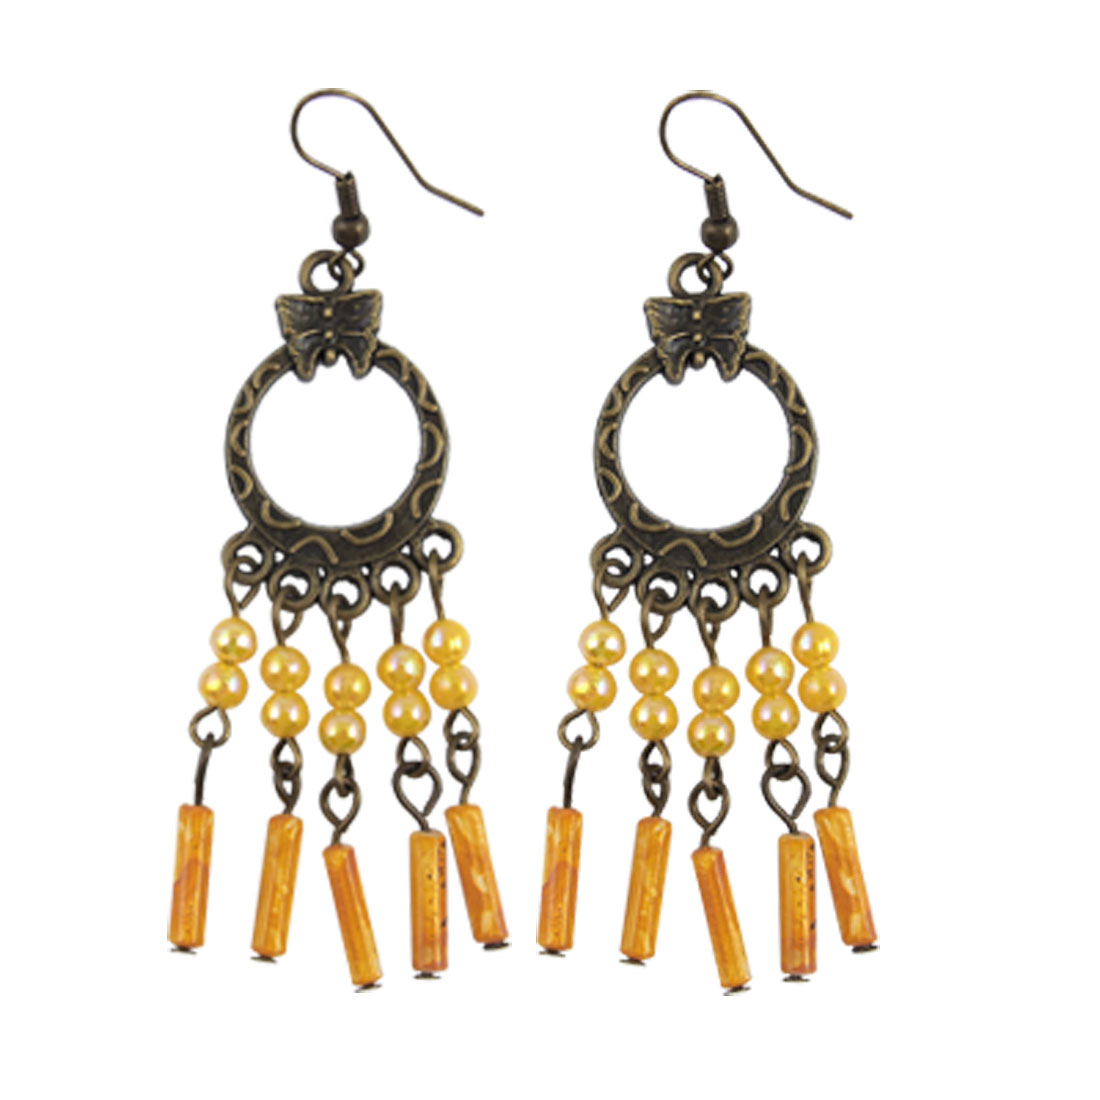 Retro-styled Beads Pendant Bronze Tone Ear Hook Earrings